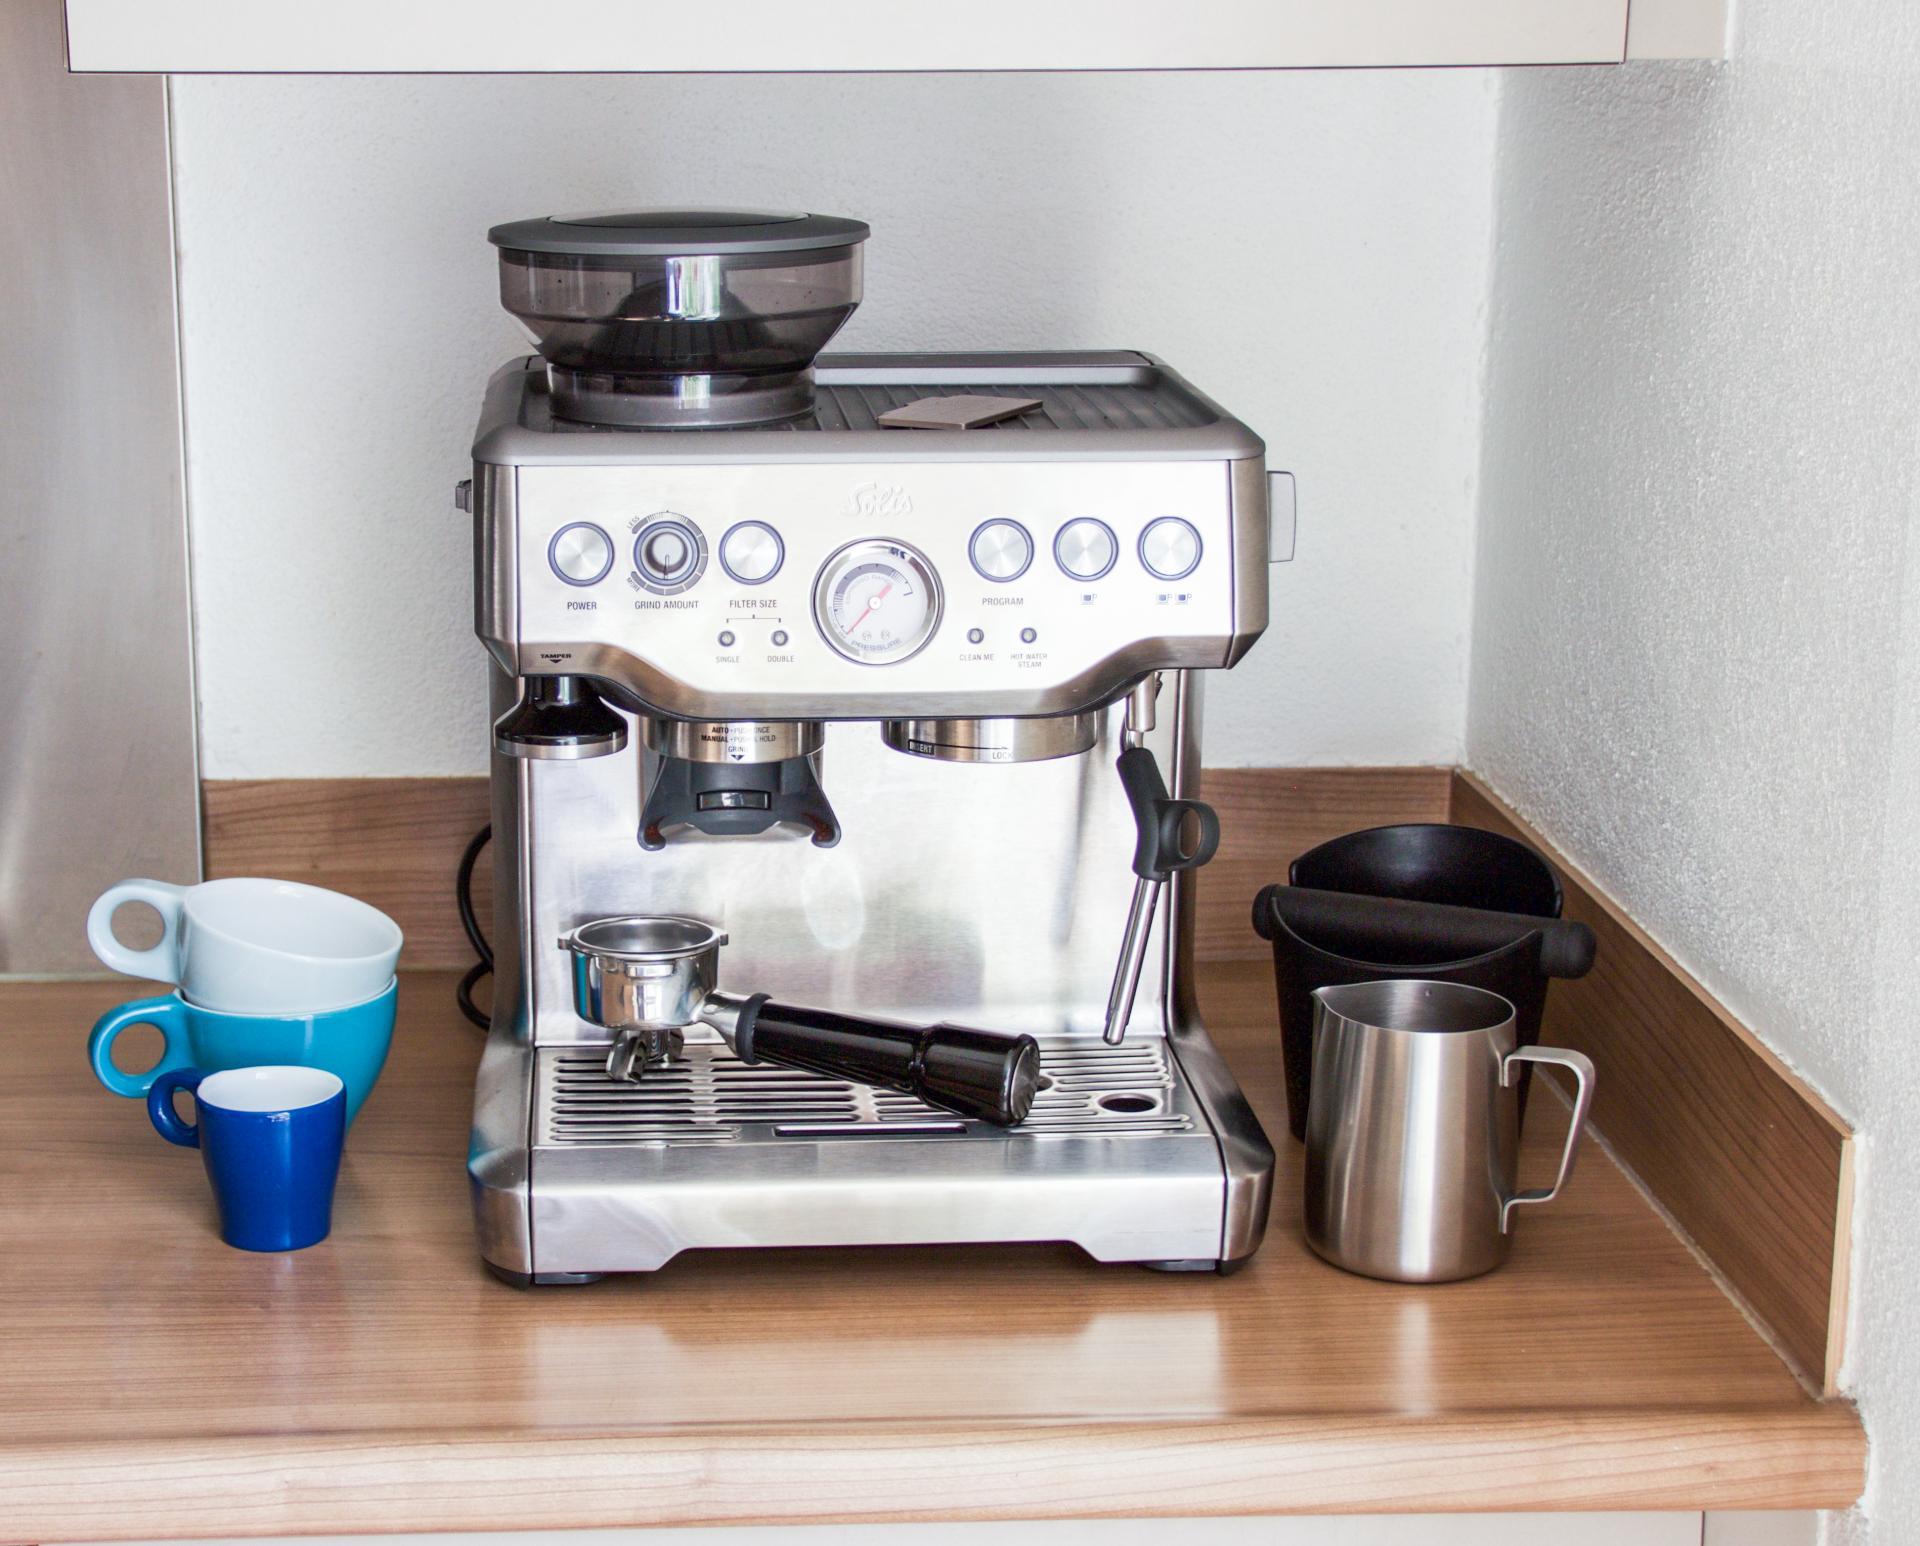 Solis koffiezetapparaat